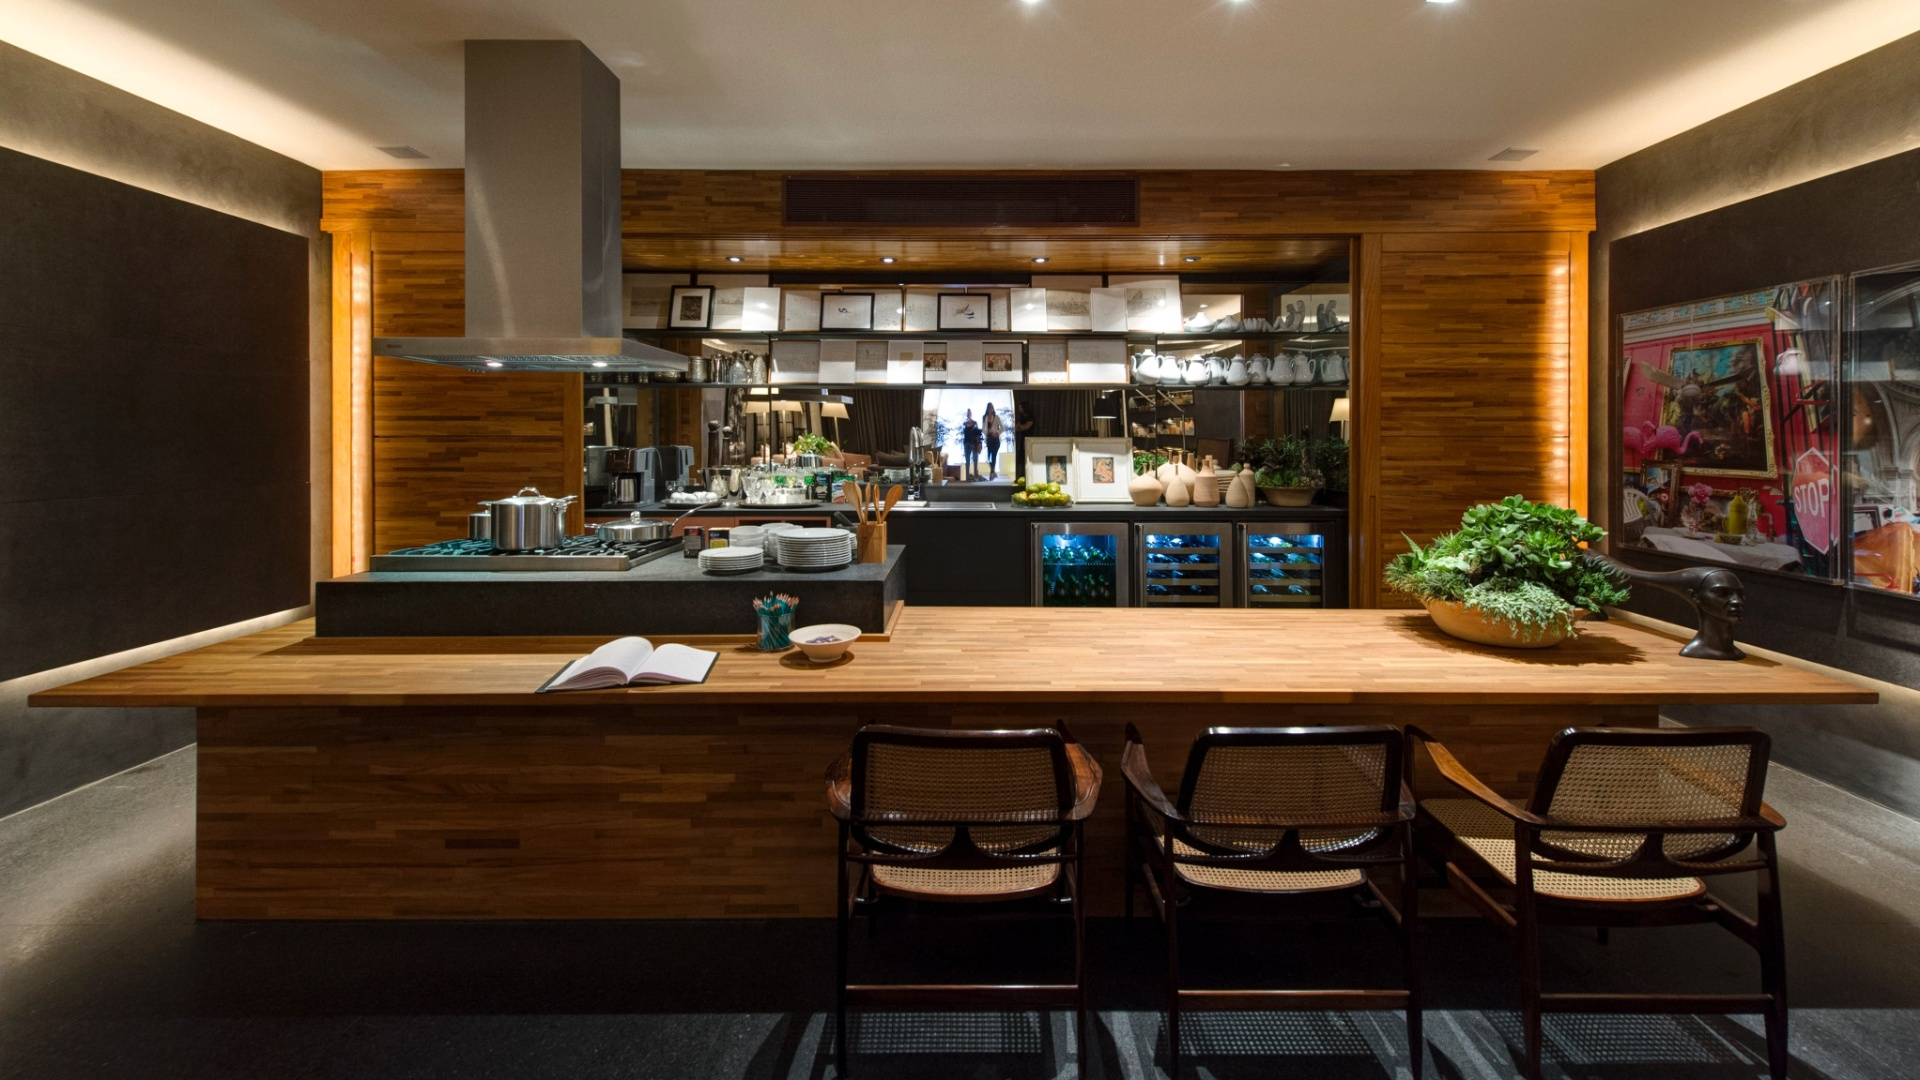 confira algumas fotos a seguir de belos modelos de cozinha americana #A76924 1920x1080